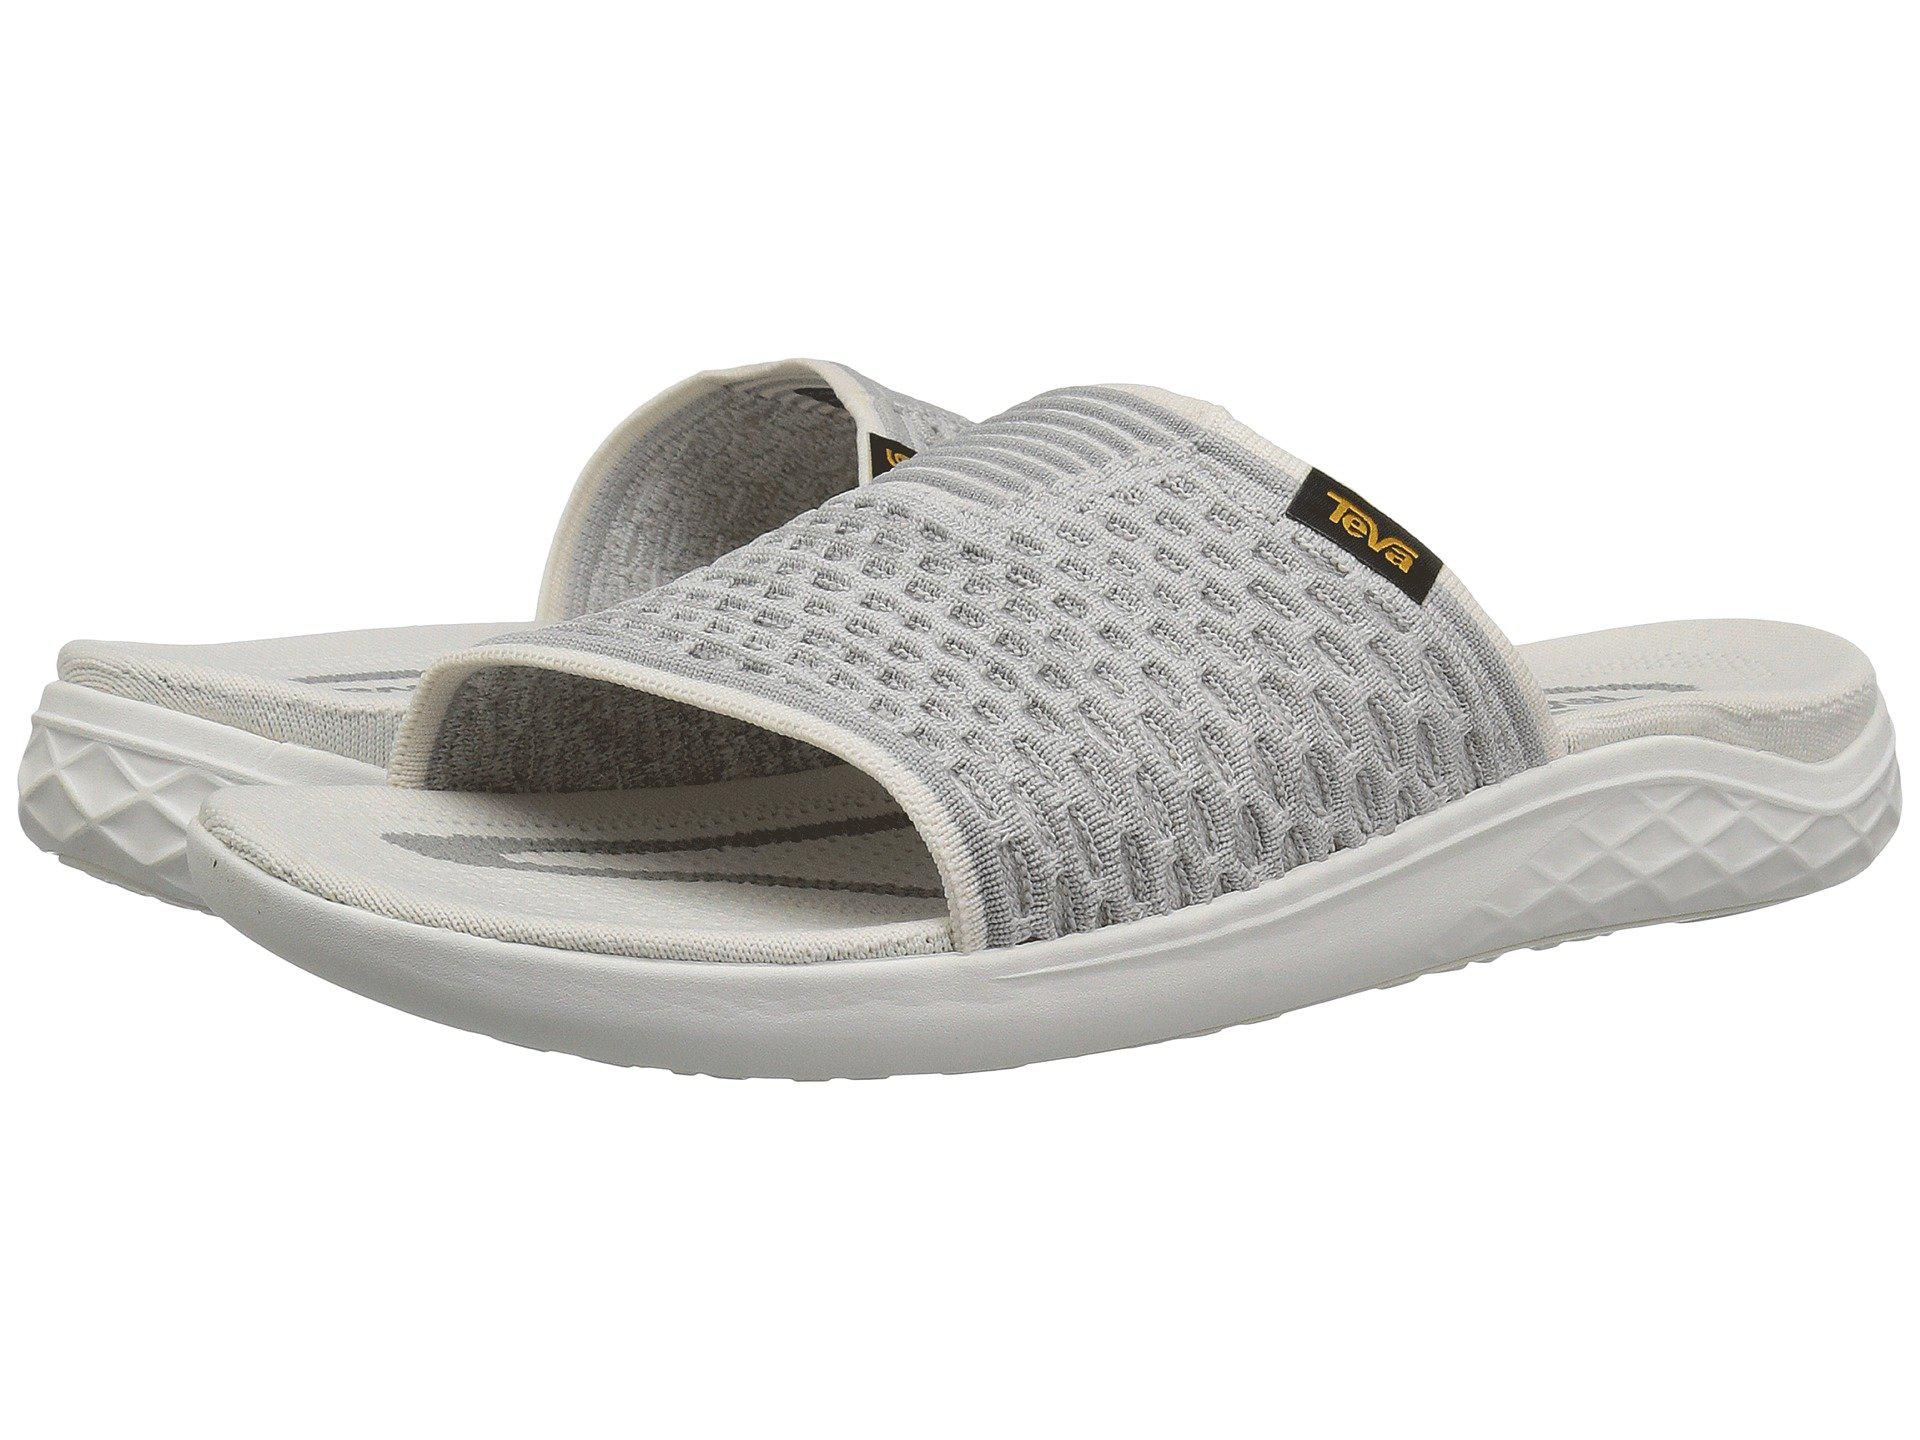 49e1472a2640 Lyst - Teva Terra-float 2 Knit Slide (bright White) Men s Shoes in ...